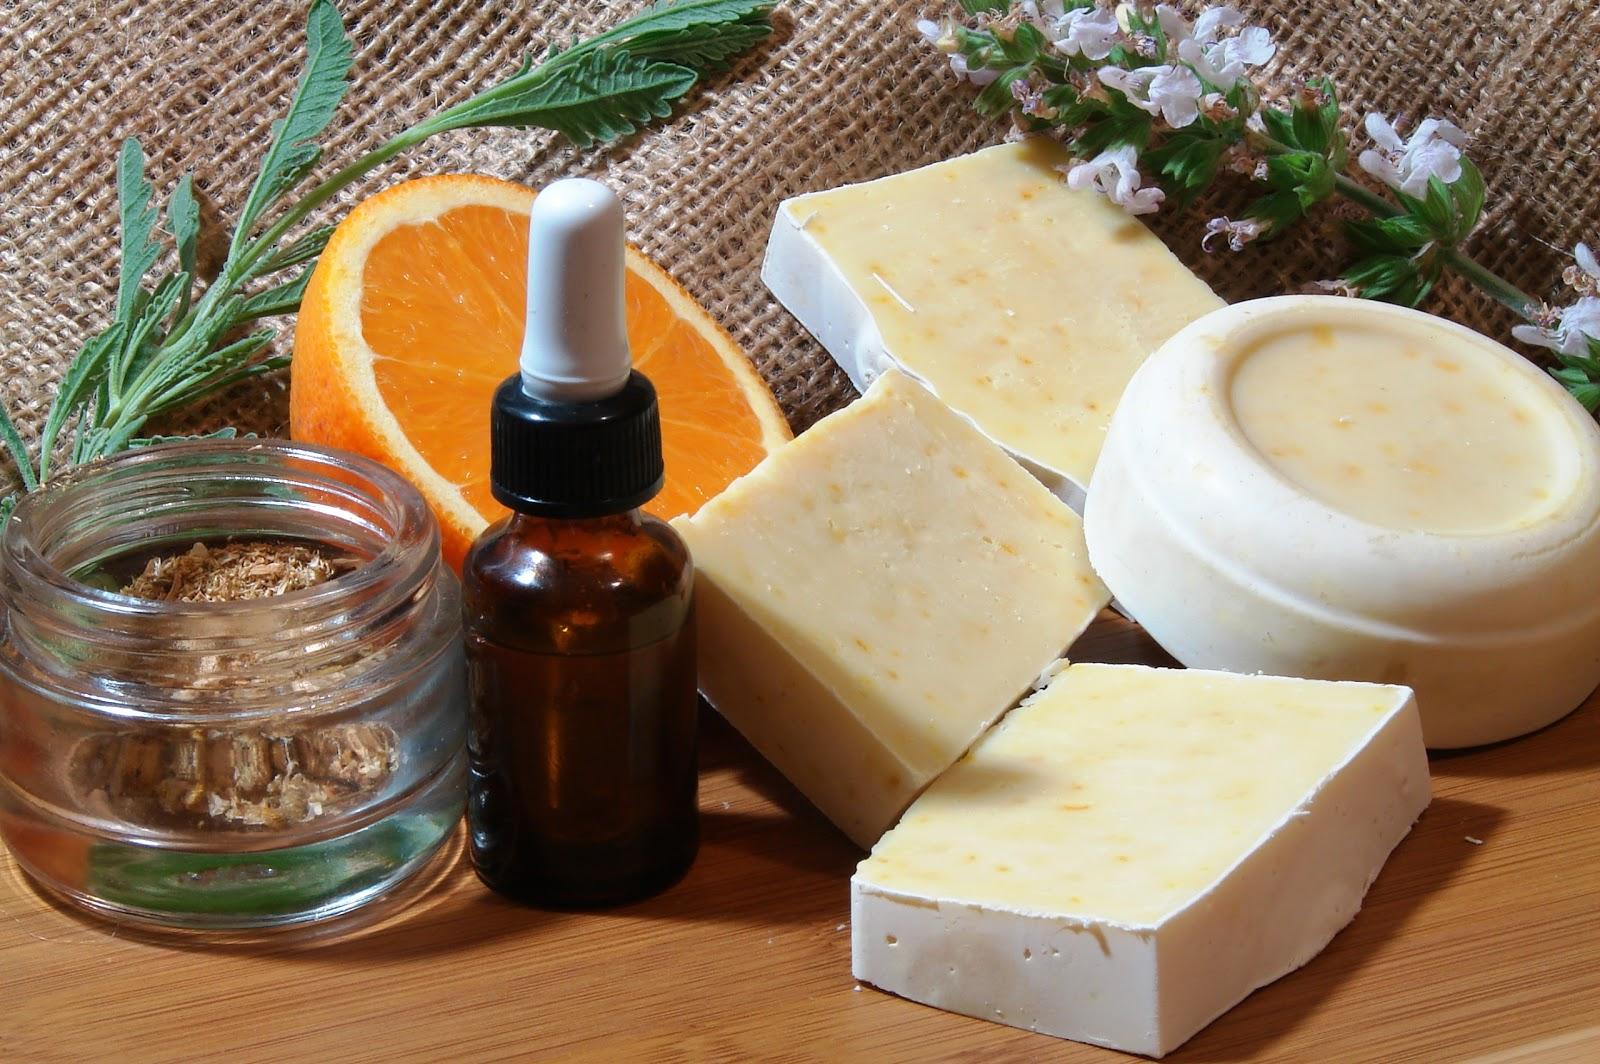 Handmade soap with orange